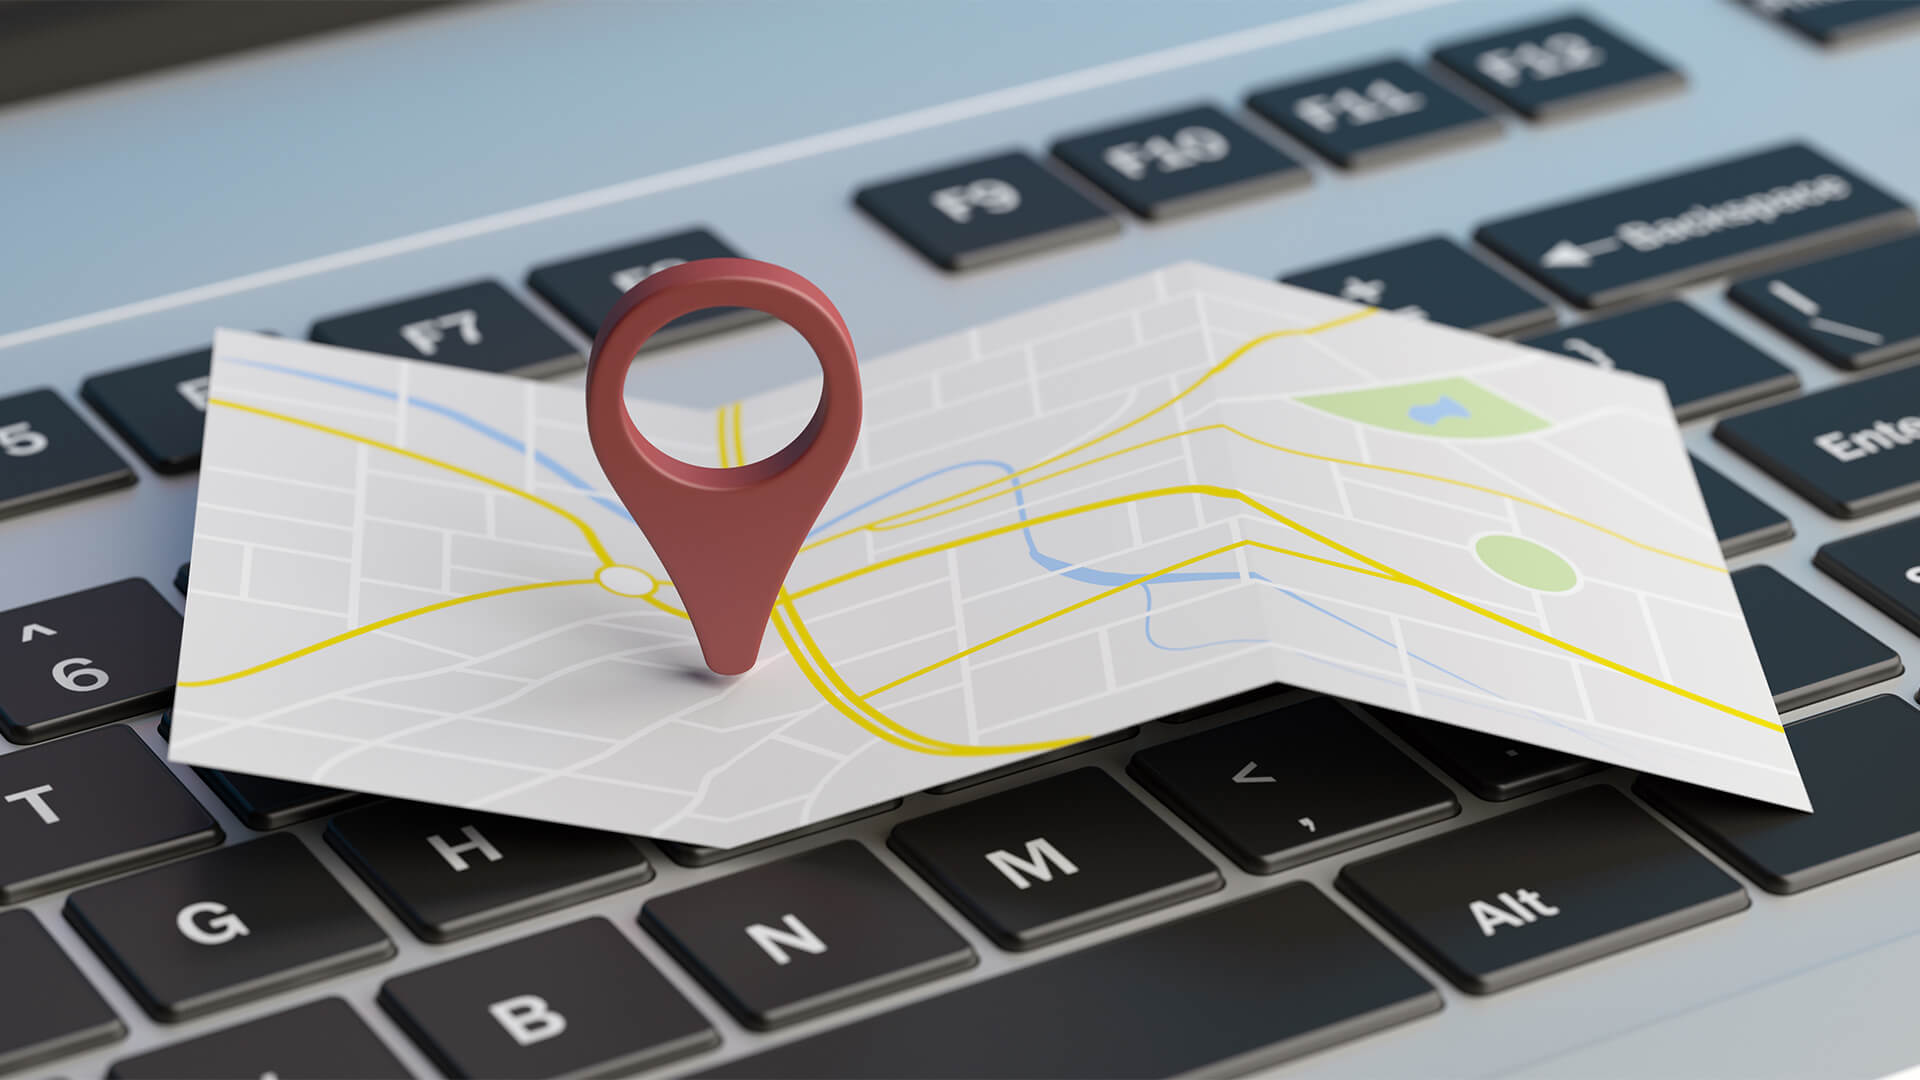 cách tối ưu SEO website, cách tối ưu SEO website bất động sản